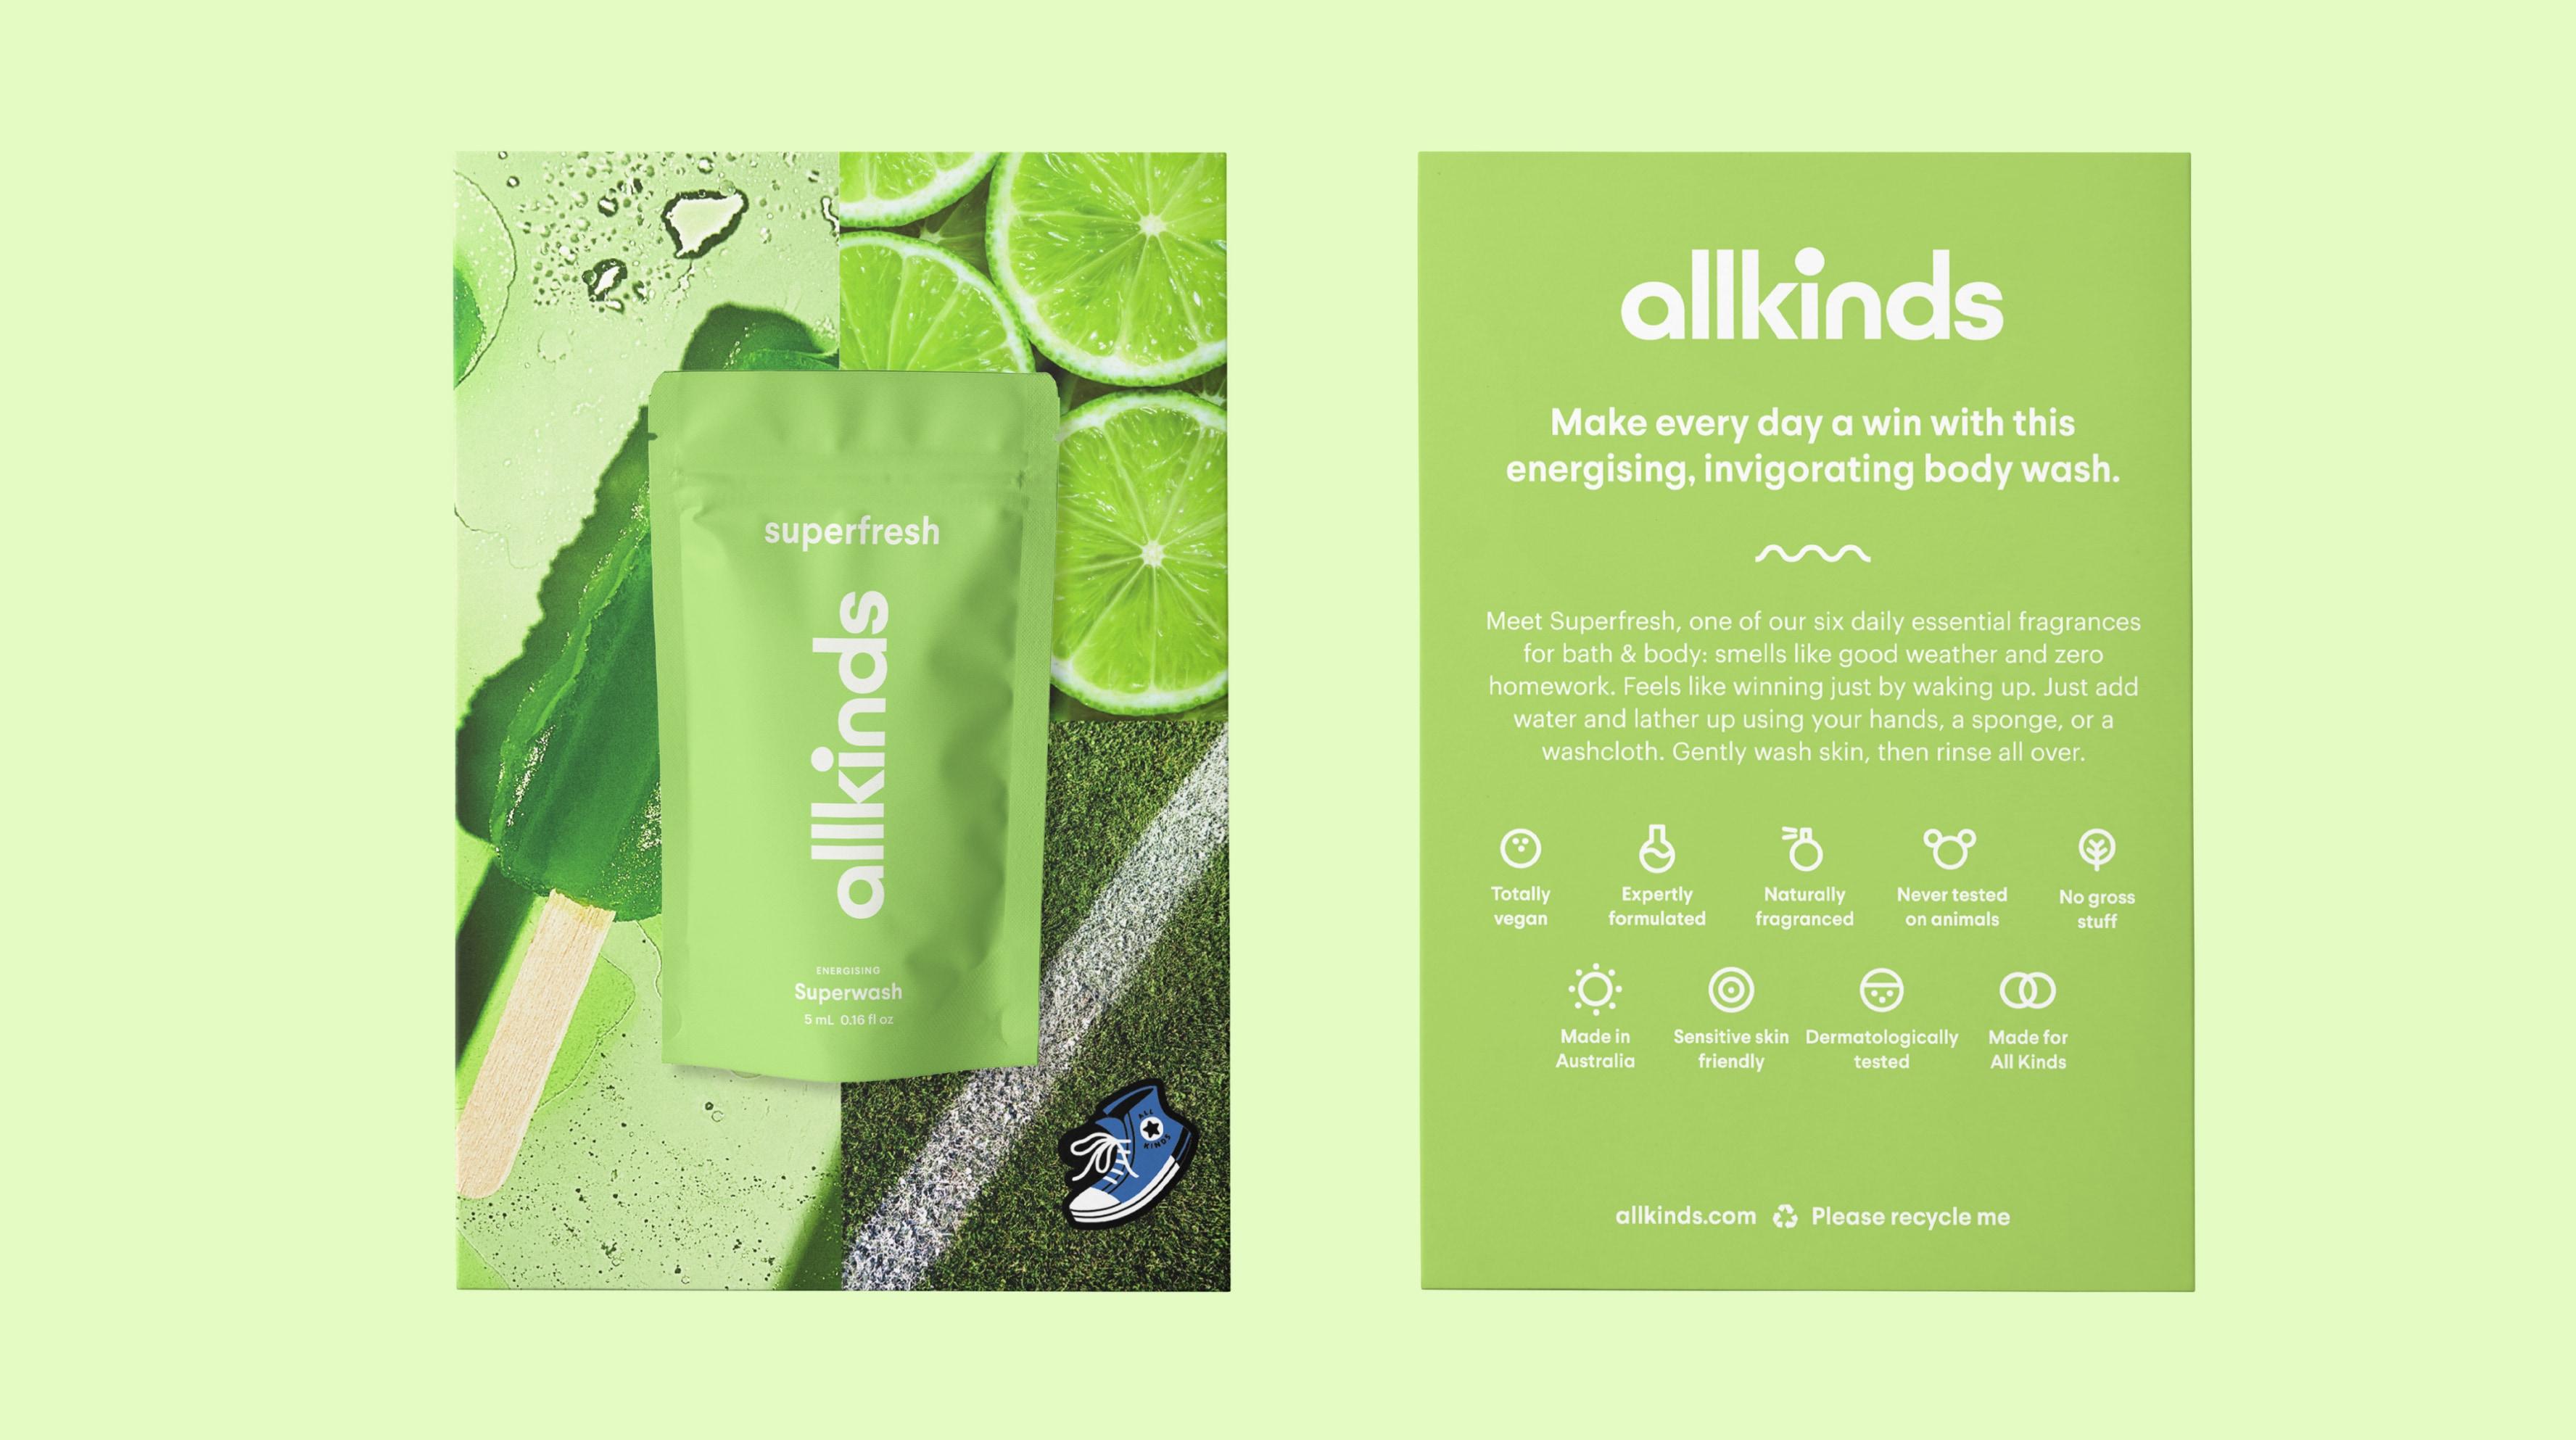 Allkinds Superfresh Superwash sample and sampling card packaging for retail distribution